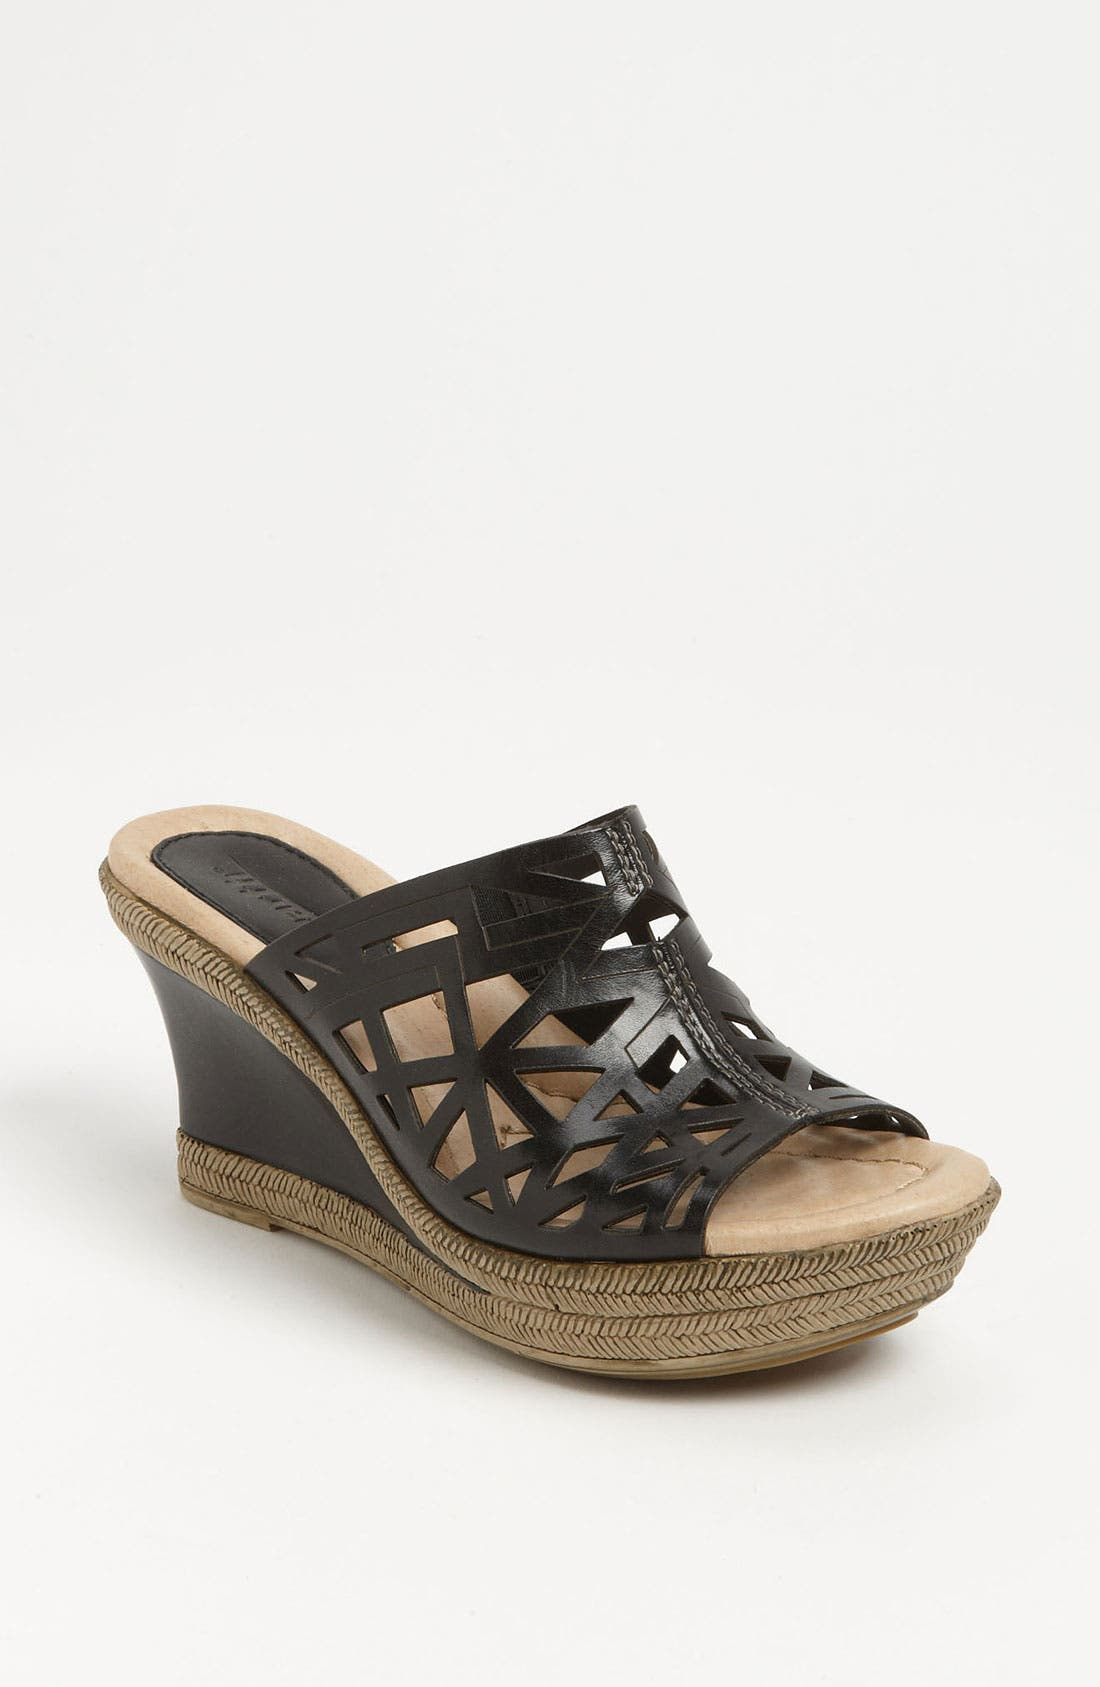 Alternate Image 1 Selected - Earth® 'Sugarpine' Sandal